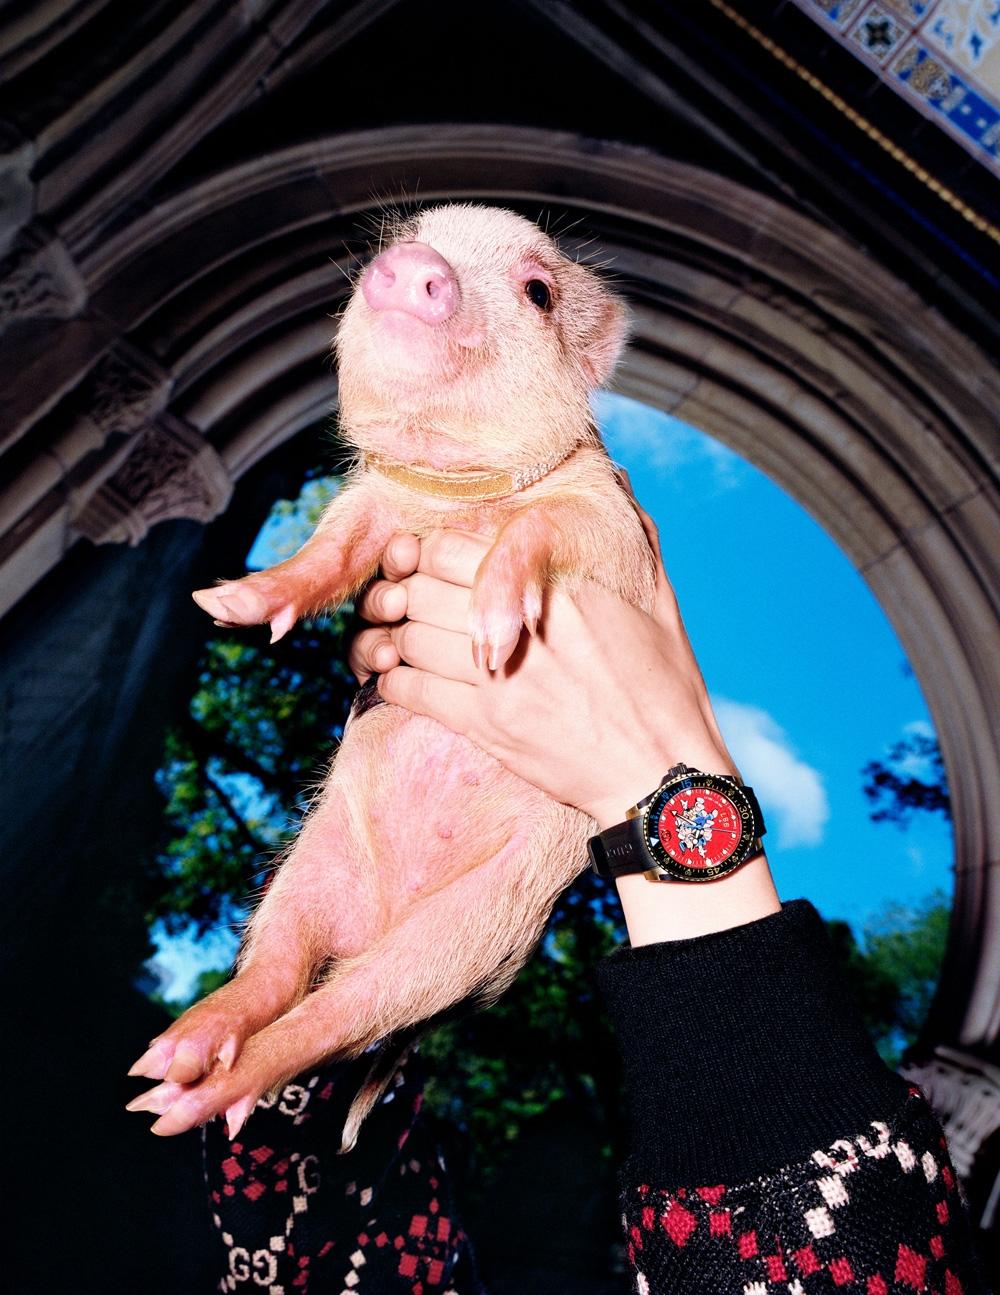 Gucci豬豬家族登場!迪士尼三隻小豬、翹屁嫩豬、飛天小豬粉嫩上線